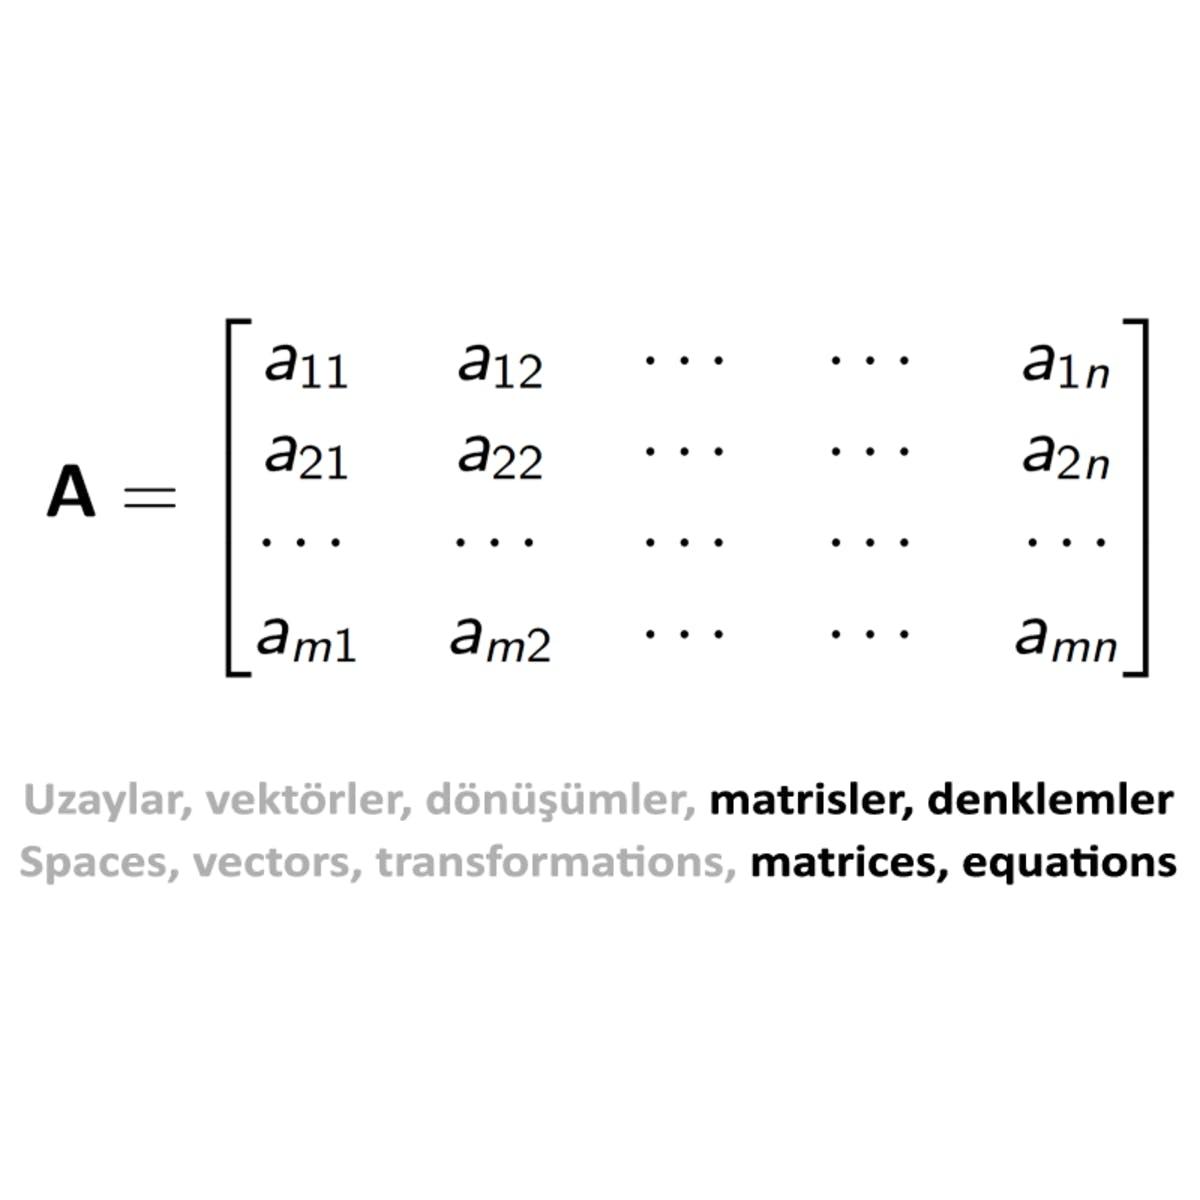 Doğrusal Cebir II: Kare Matrisler, Hesaplama Yöntemleri ve Uygulamalar / Linear Algebra II: Square Matrices, Calculation Methods and Applications